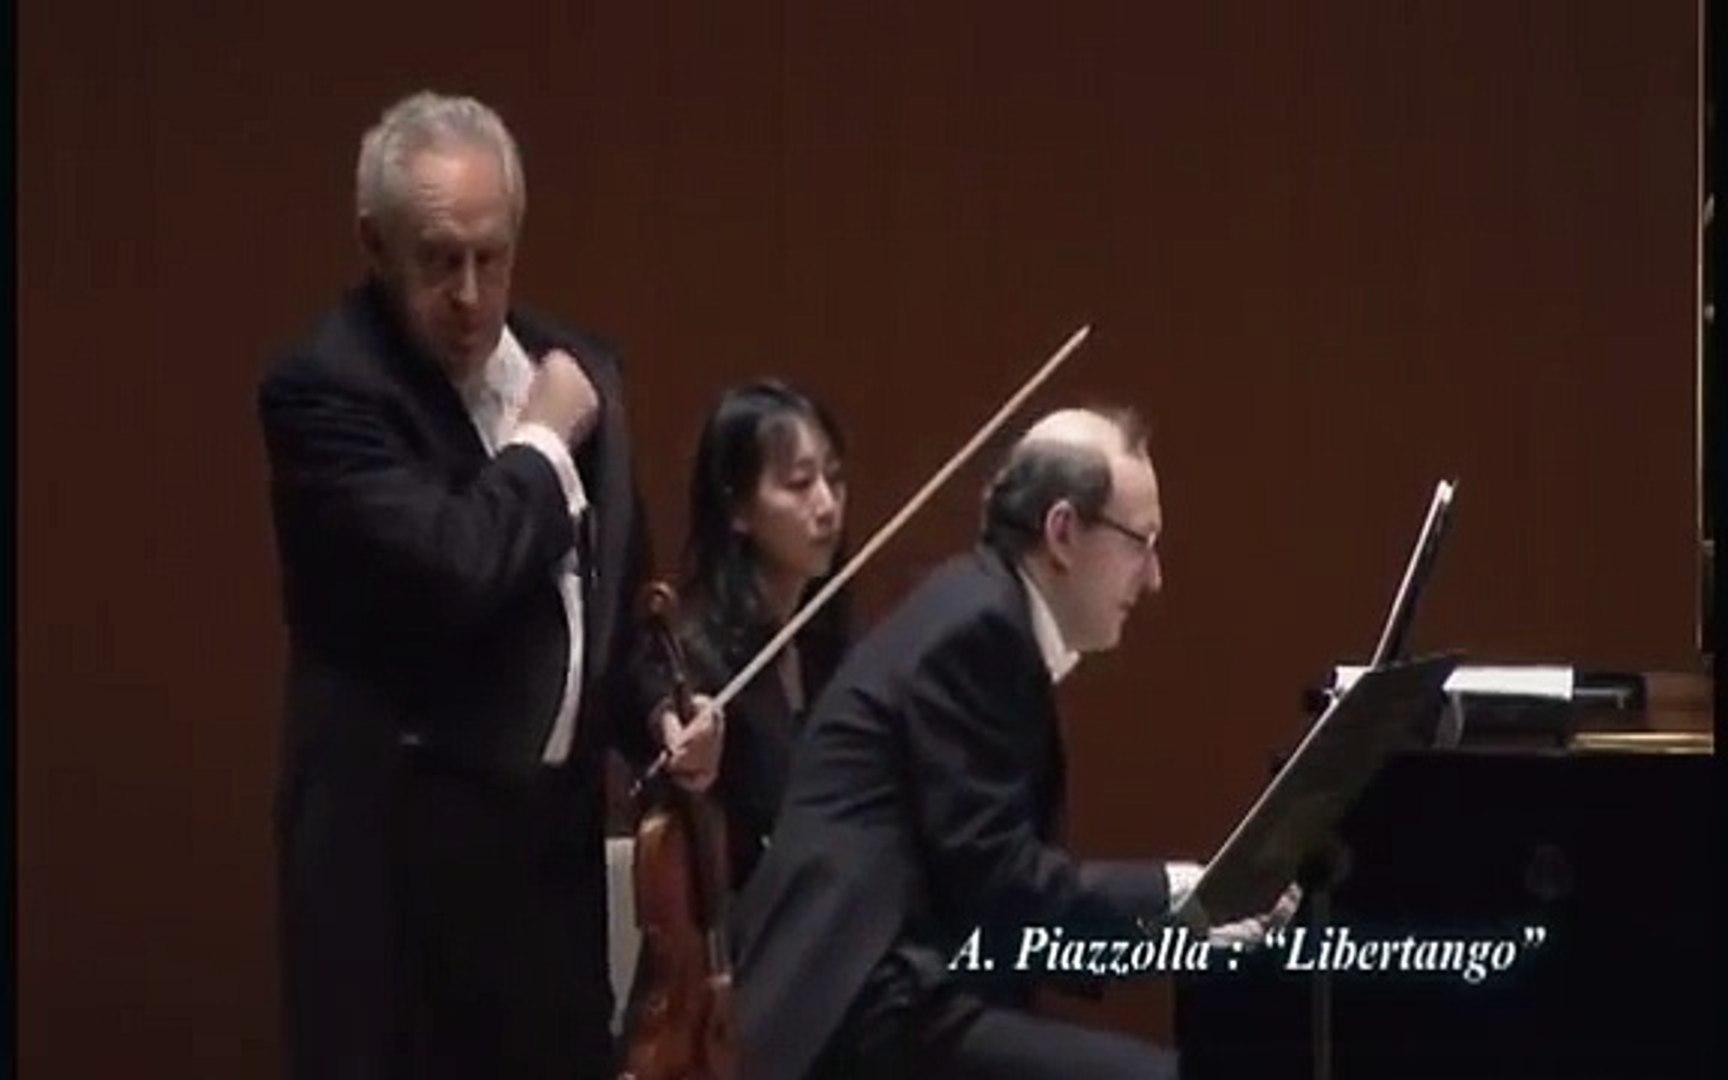 FELIX AYO violin MARCO GRISANTI piano - A PIAZZOLLA Libertango